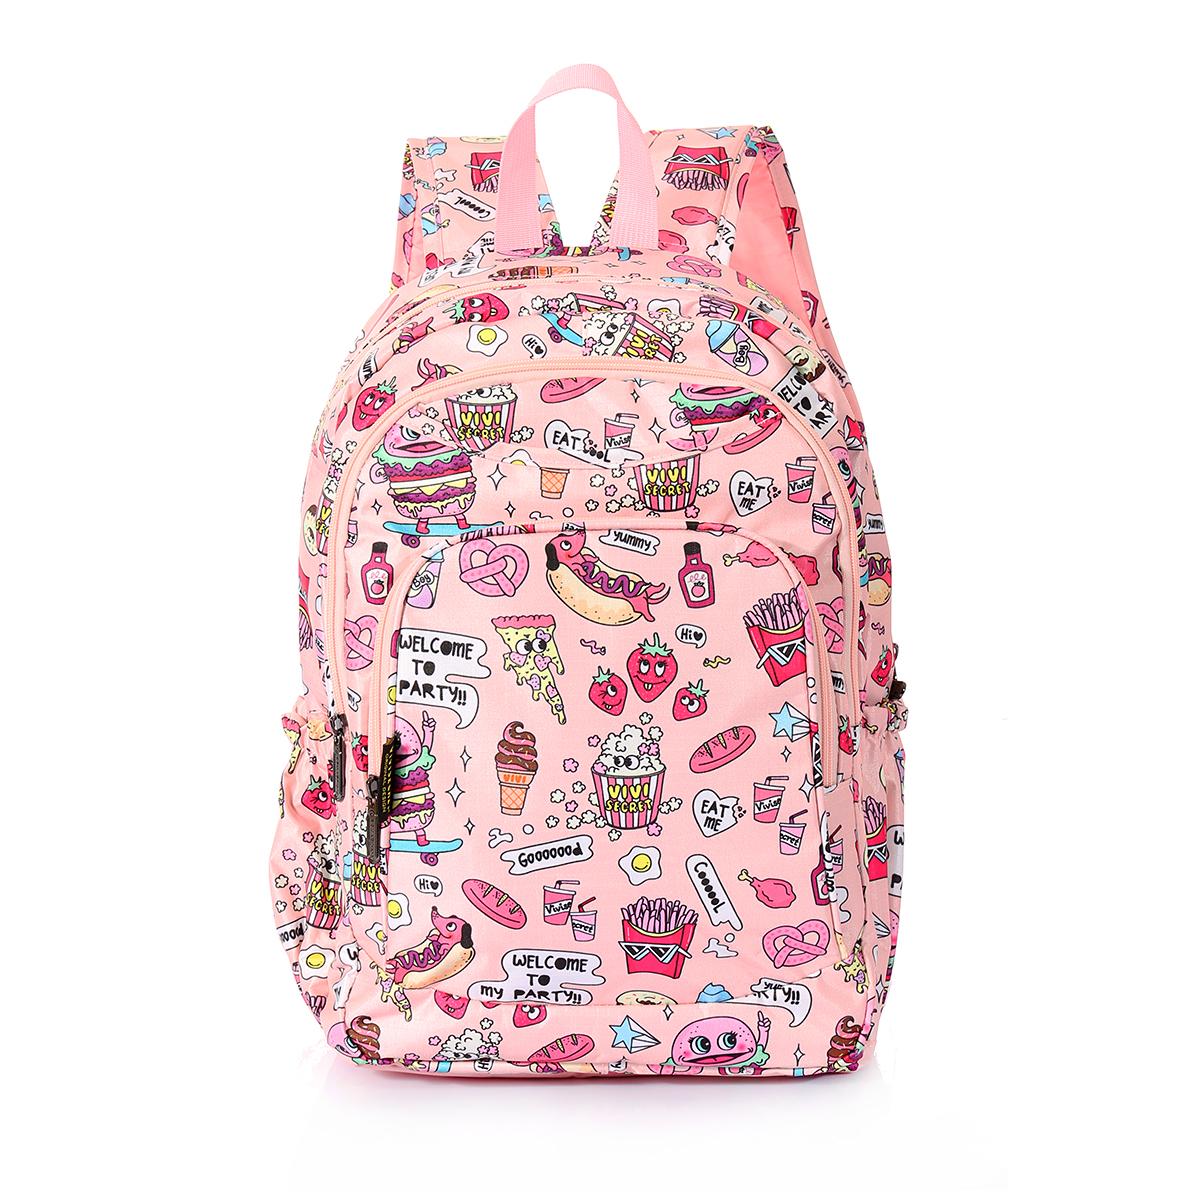 Dívčí školní batoh TopBags ViVi - Růžový 14 l - Top Batohy.cz 07a928783e